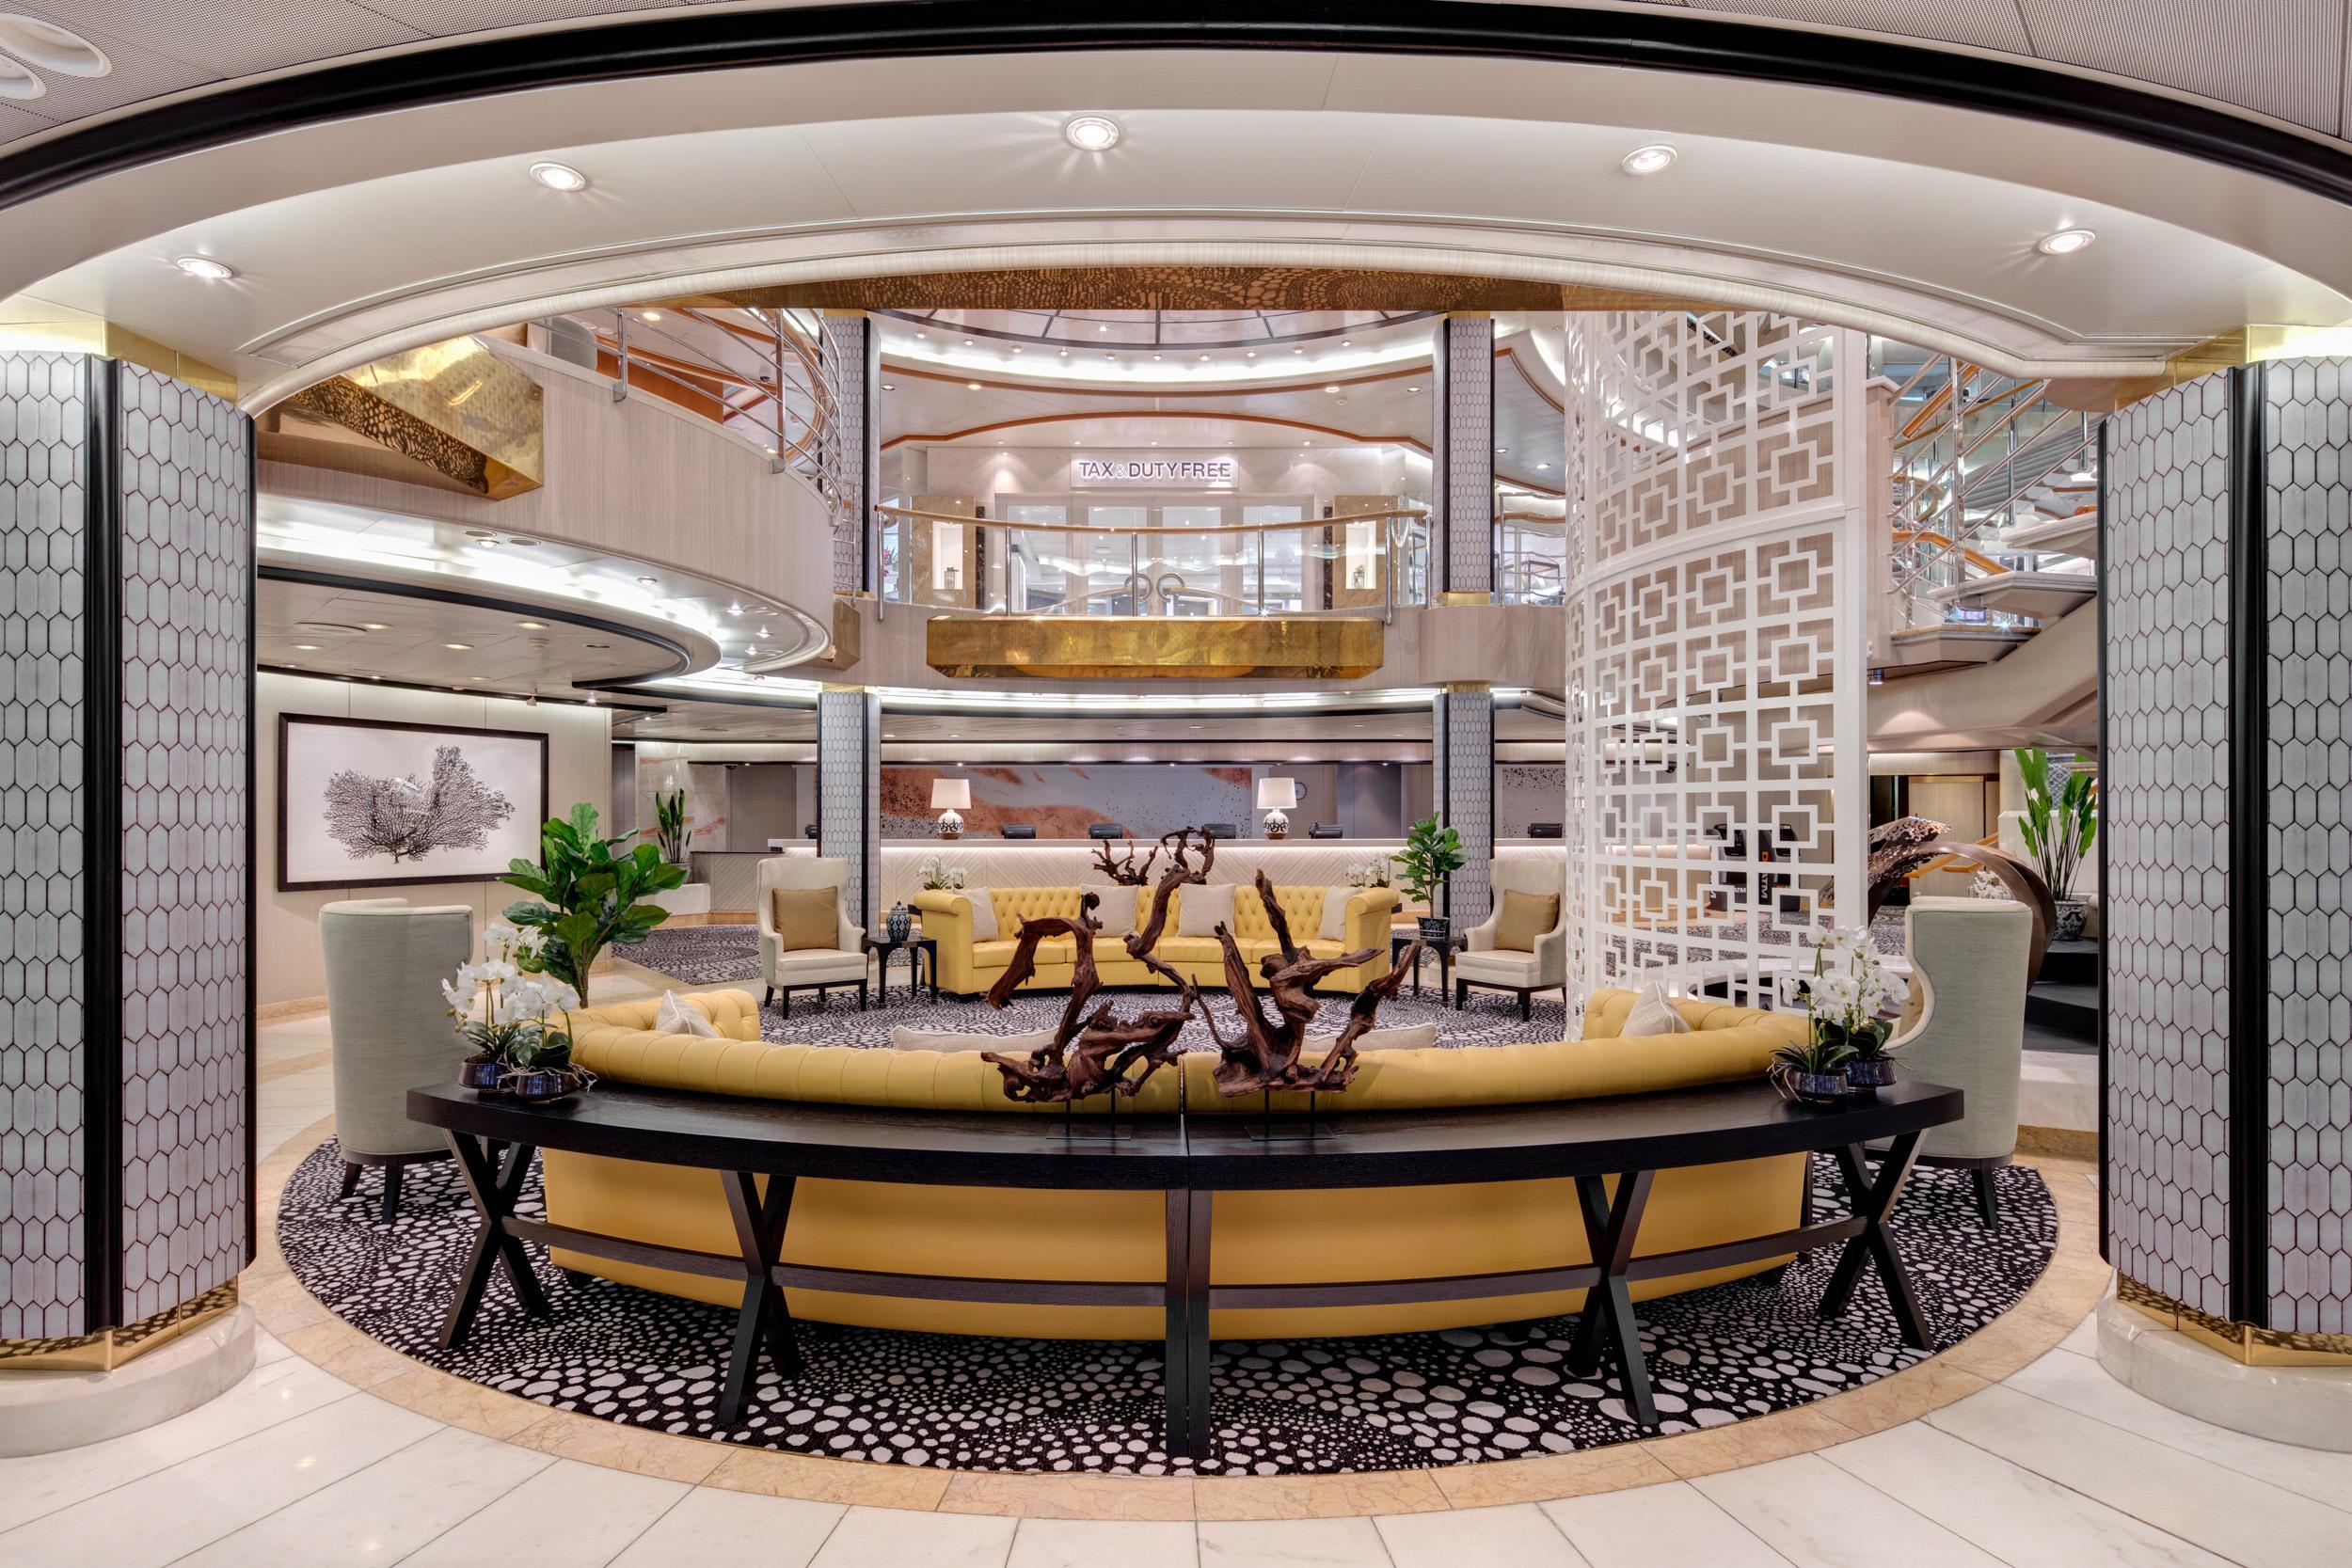 Jem_Cresswell_Architecture_Commercial_Photographer_Sydney_Australia_014.jpg